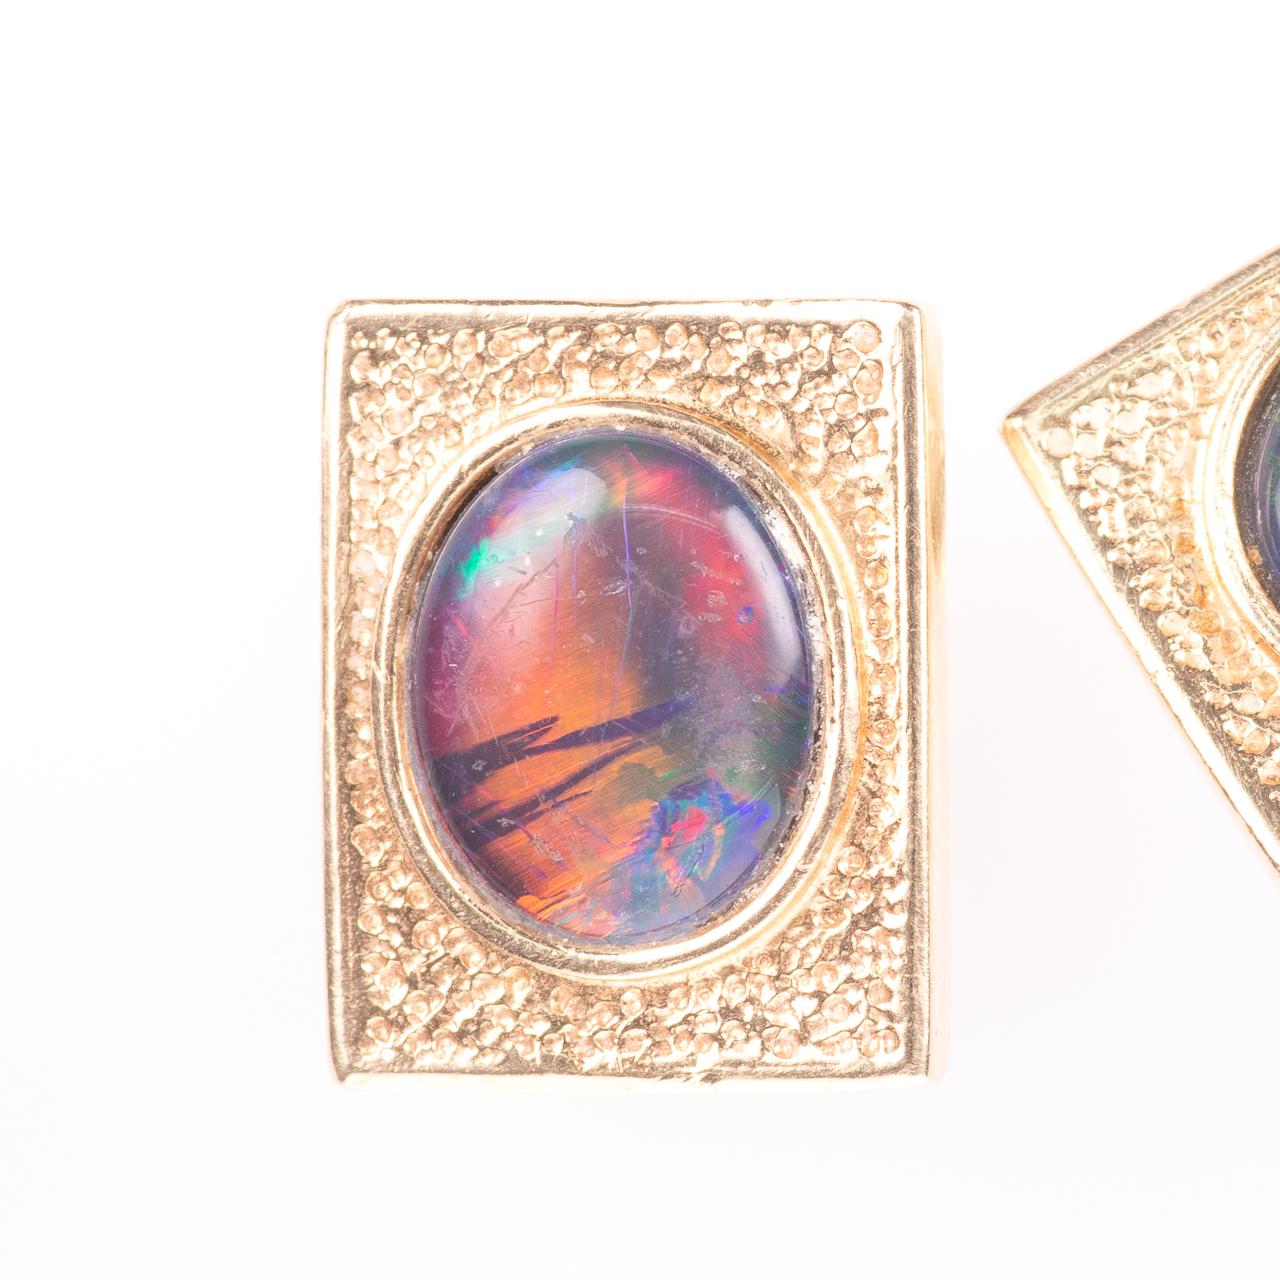 14ct Gold Gentleman's Black Lightning Opal Cufflinks - Image 3 of 6